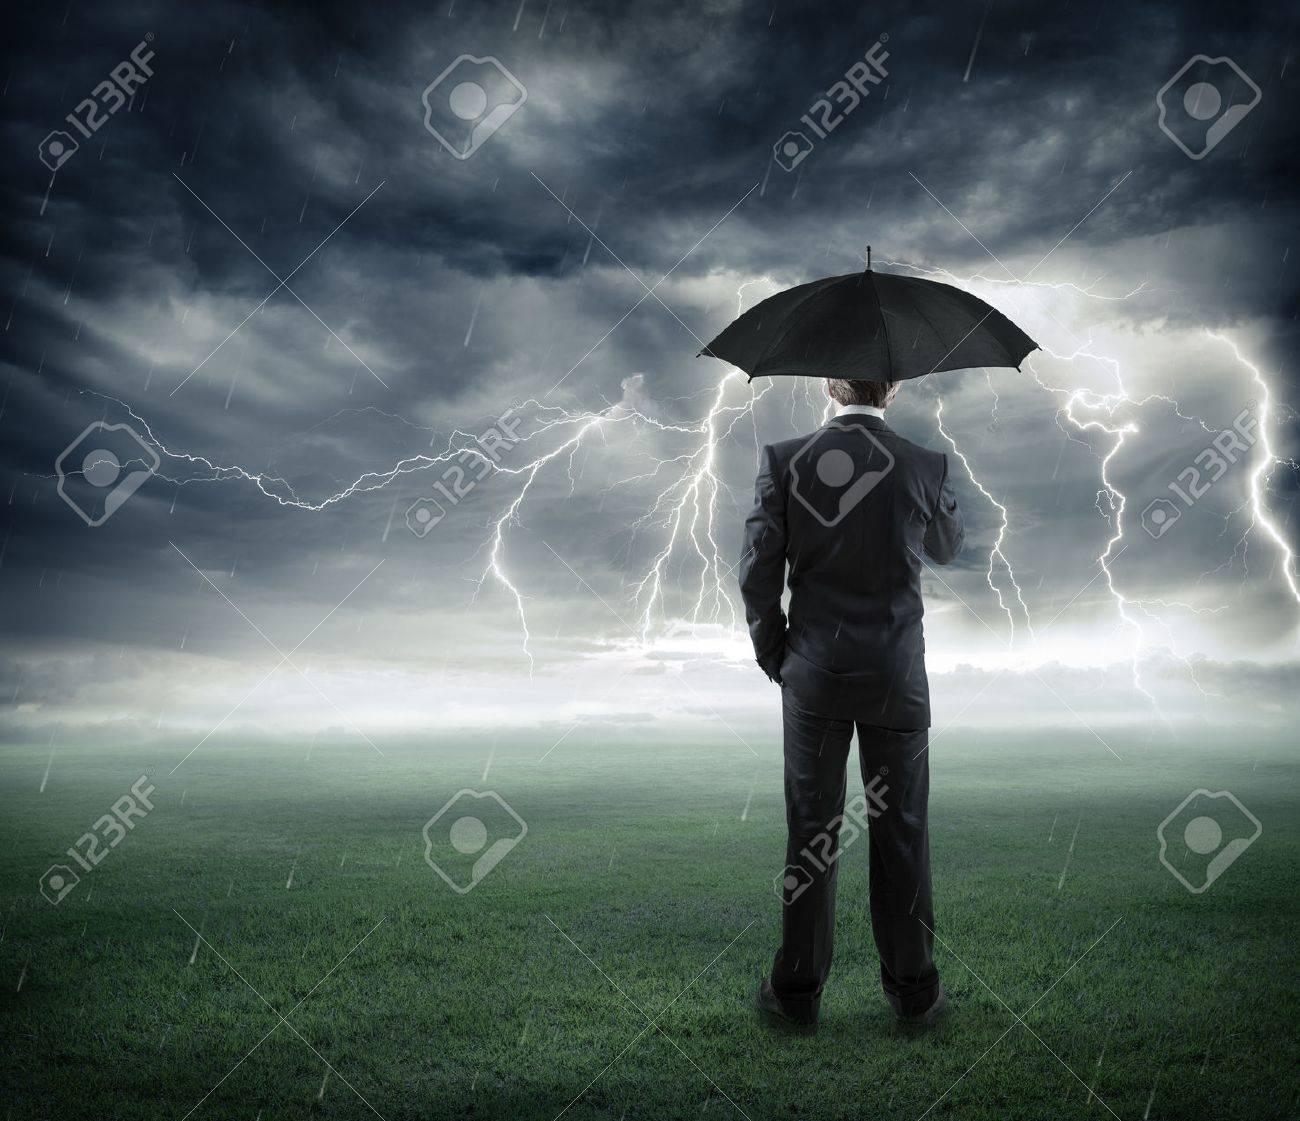 risk and crisis businessman below storm with umbrella - 41378330